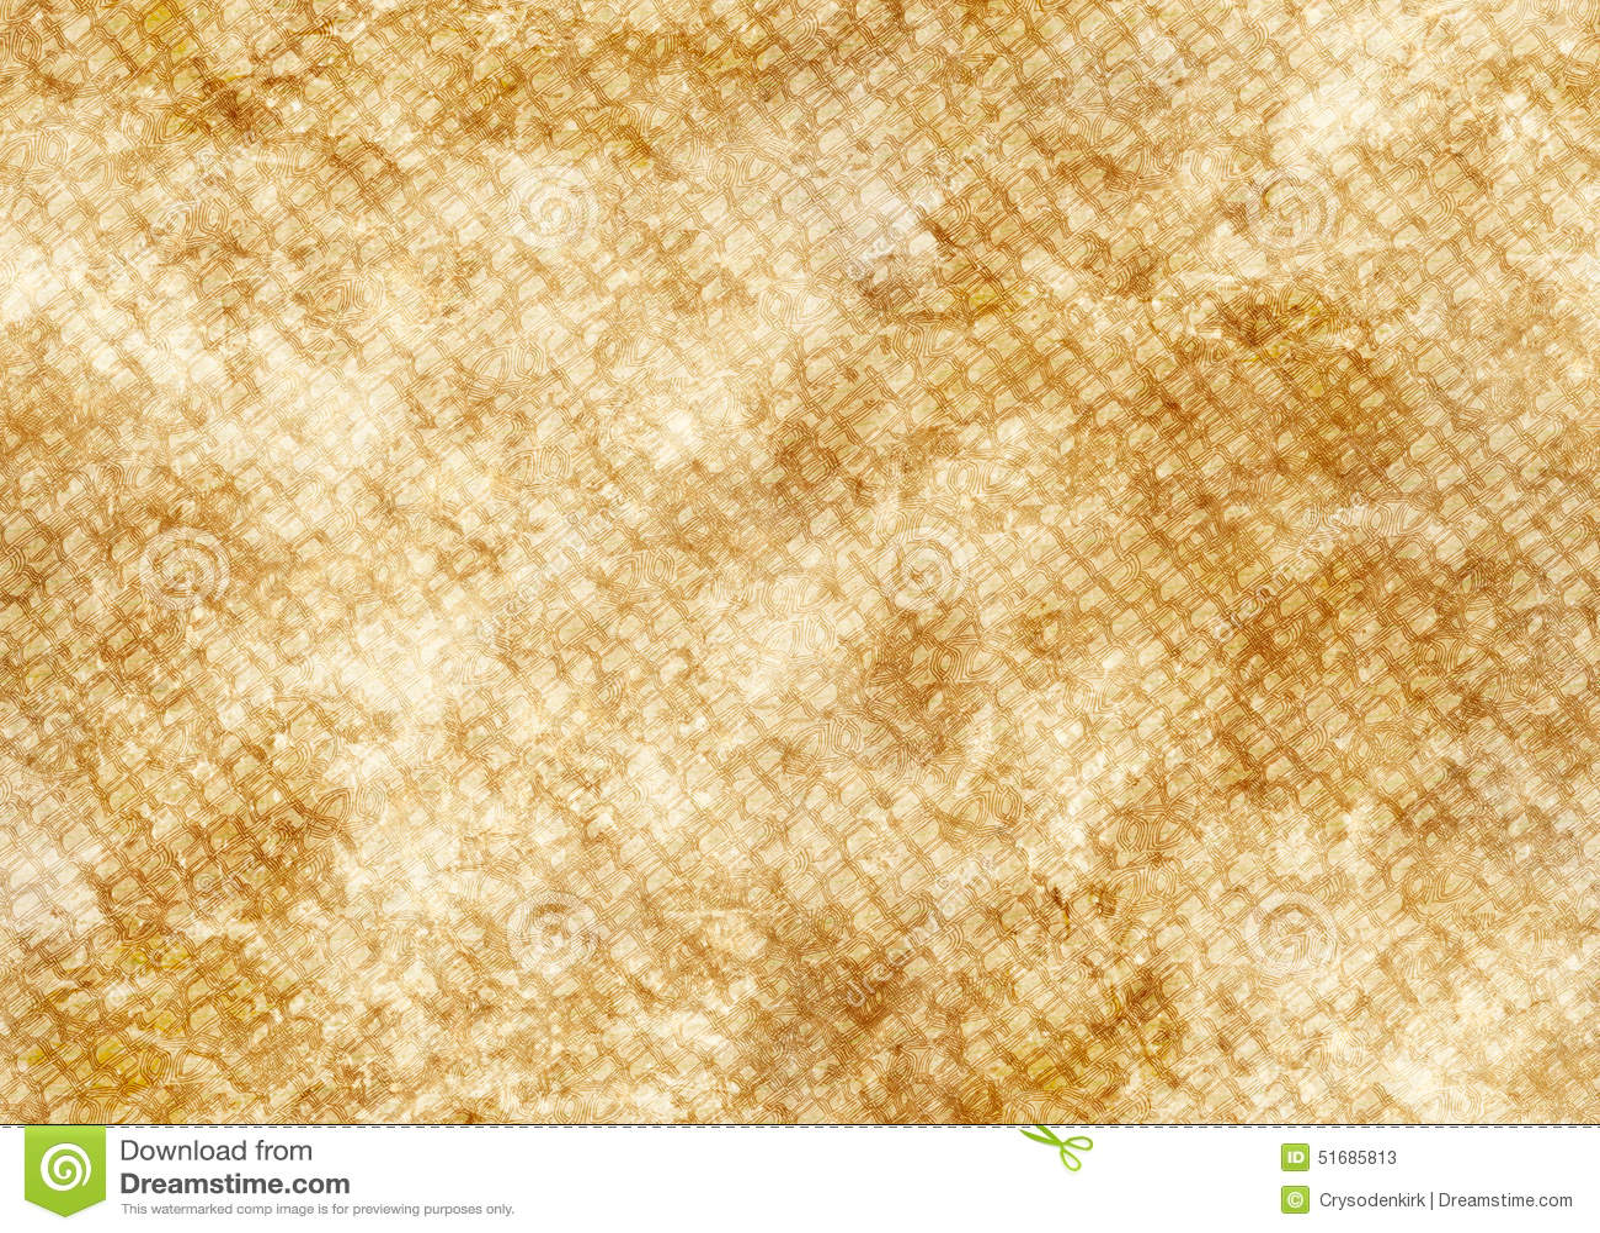 Broken Threads Seamless background texture